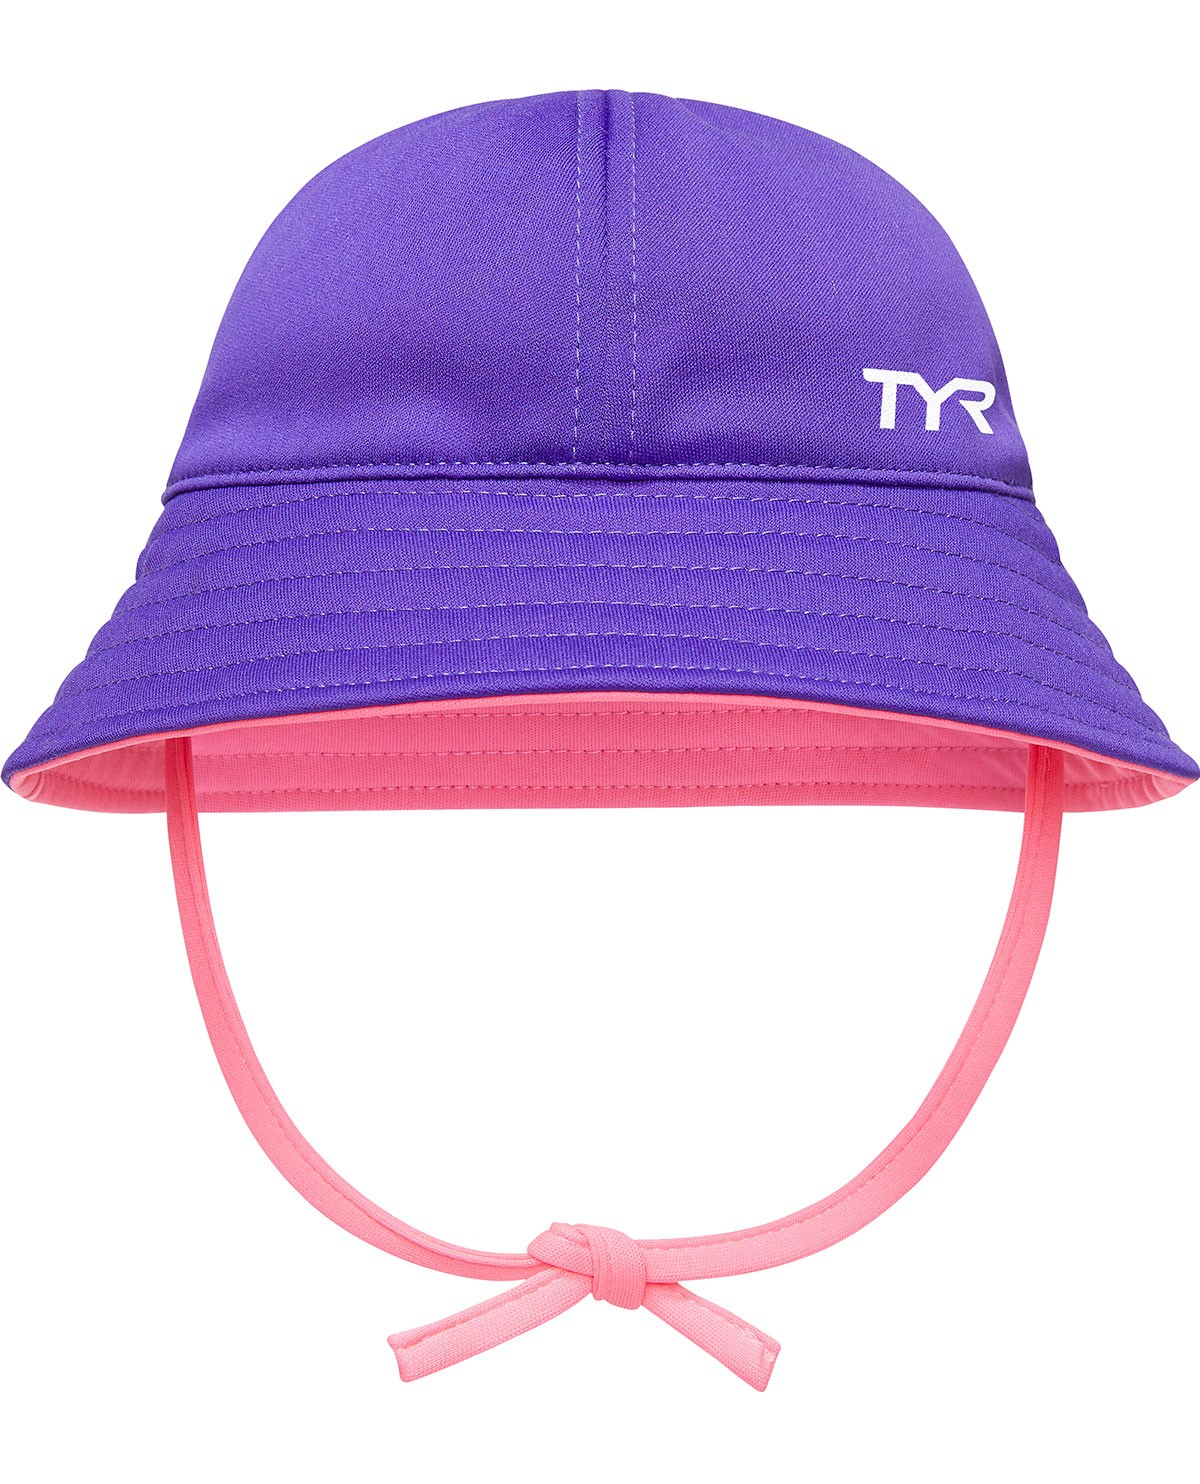 TYR Kids' Start to Swim Reversible Sun Hat 4ddede77a76